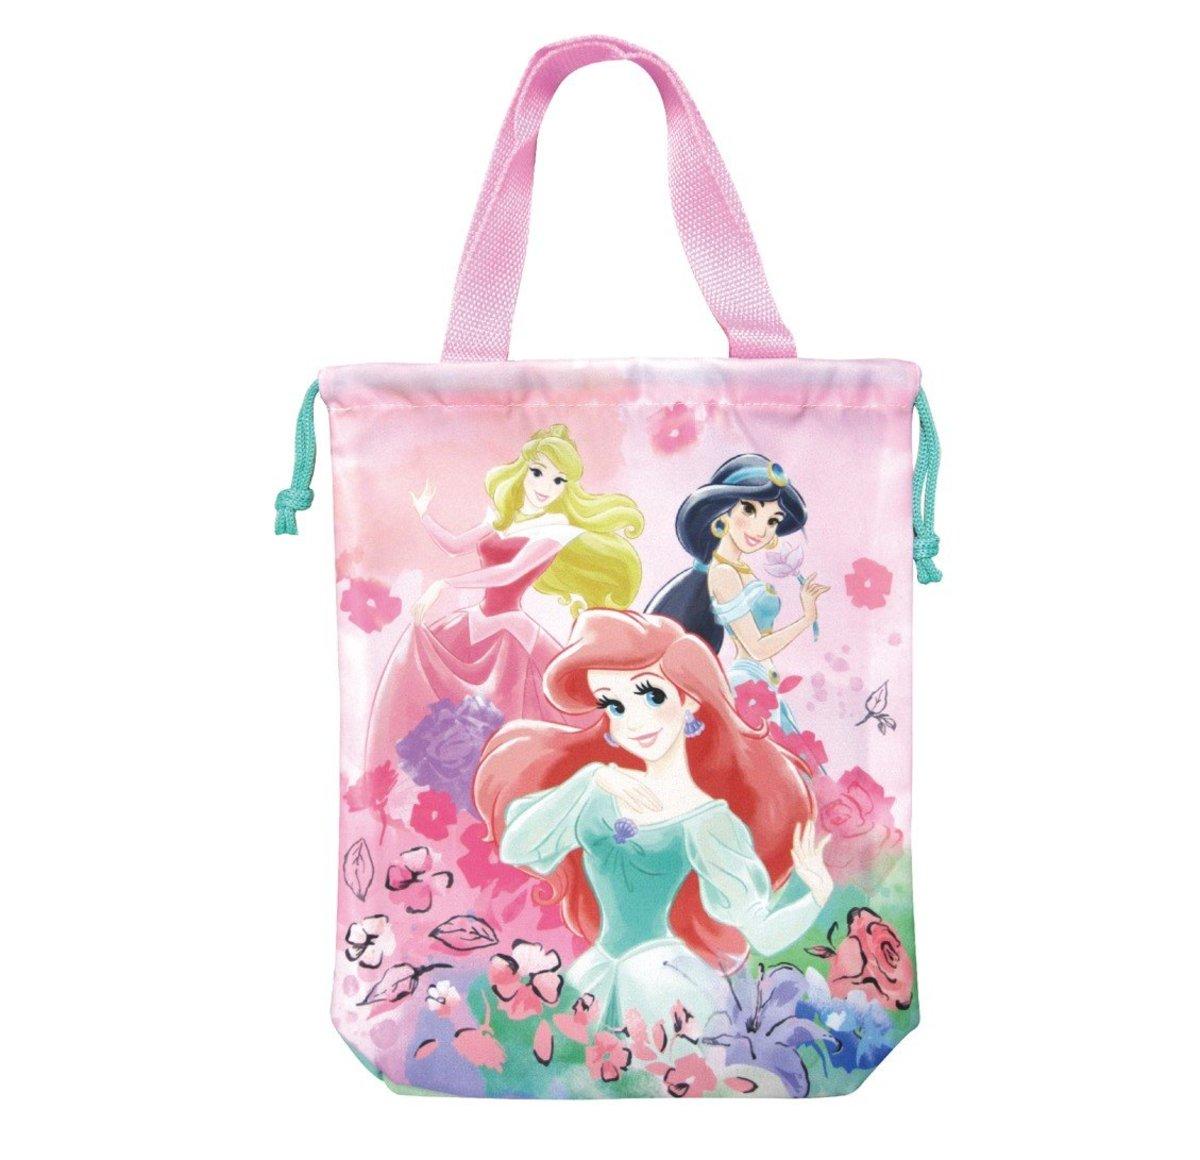 Disney迪士尼 --Drawstring bag (Licensed by Disney)